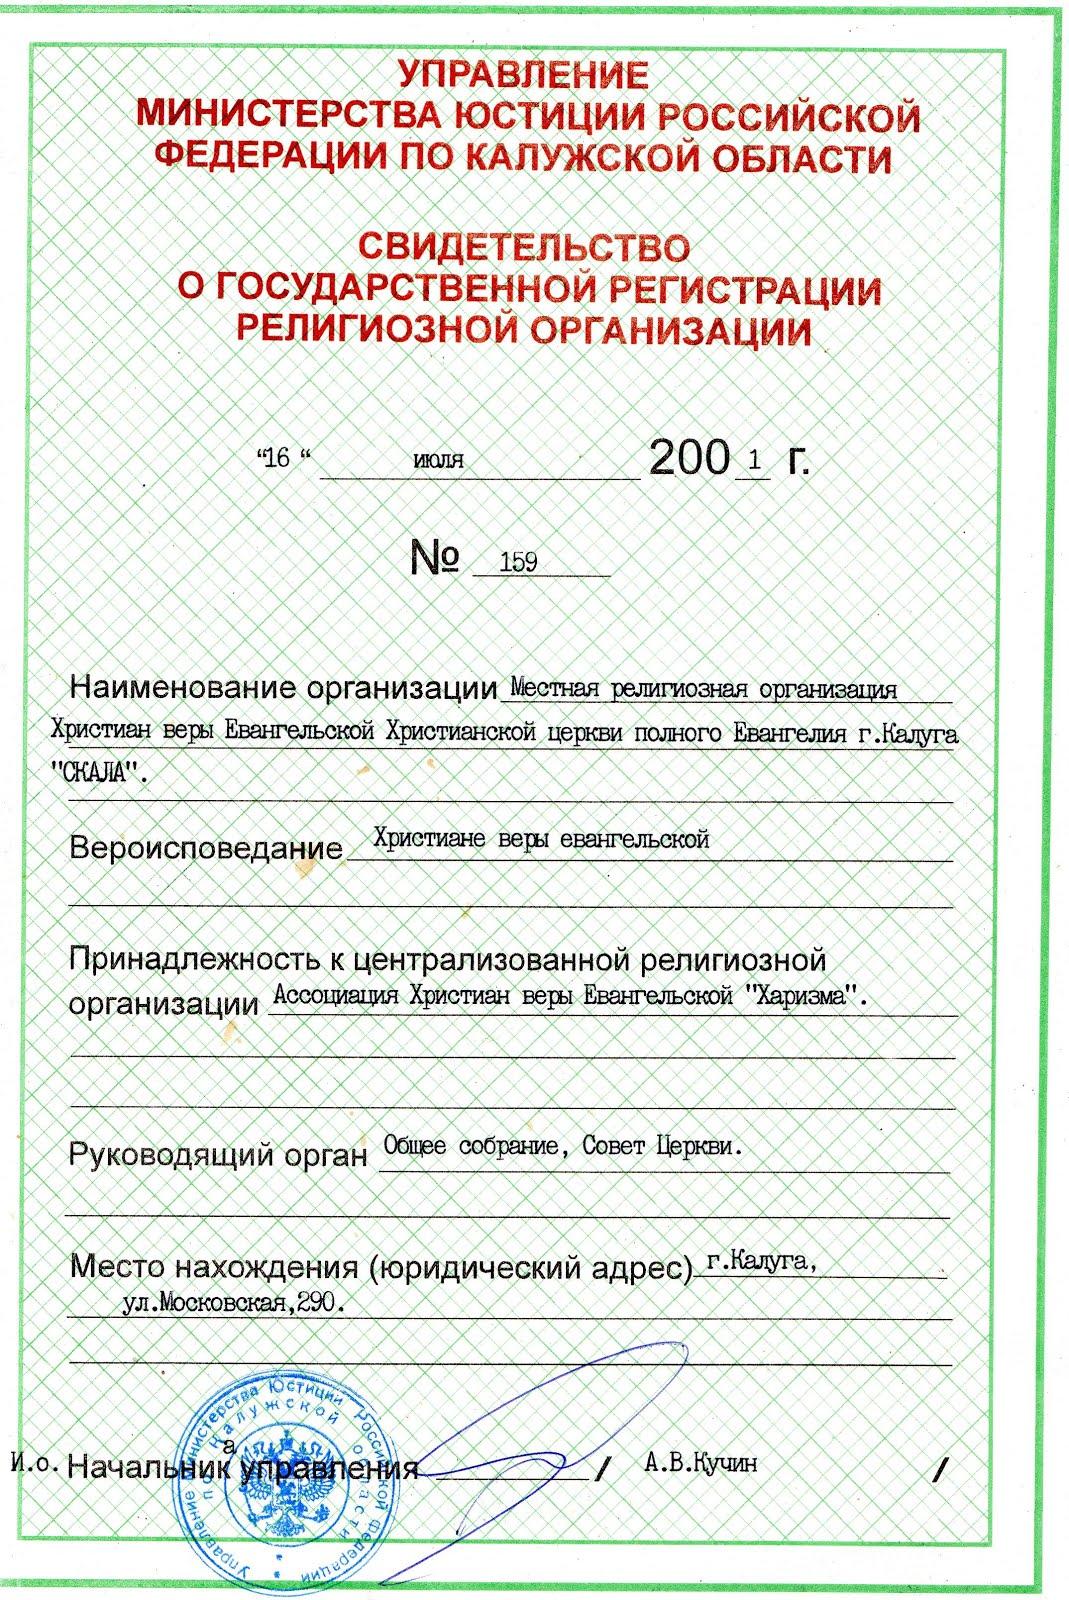 Документ о регистарации церкви.